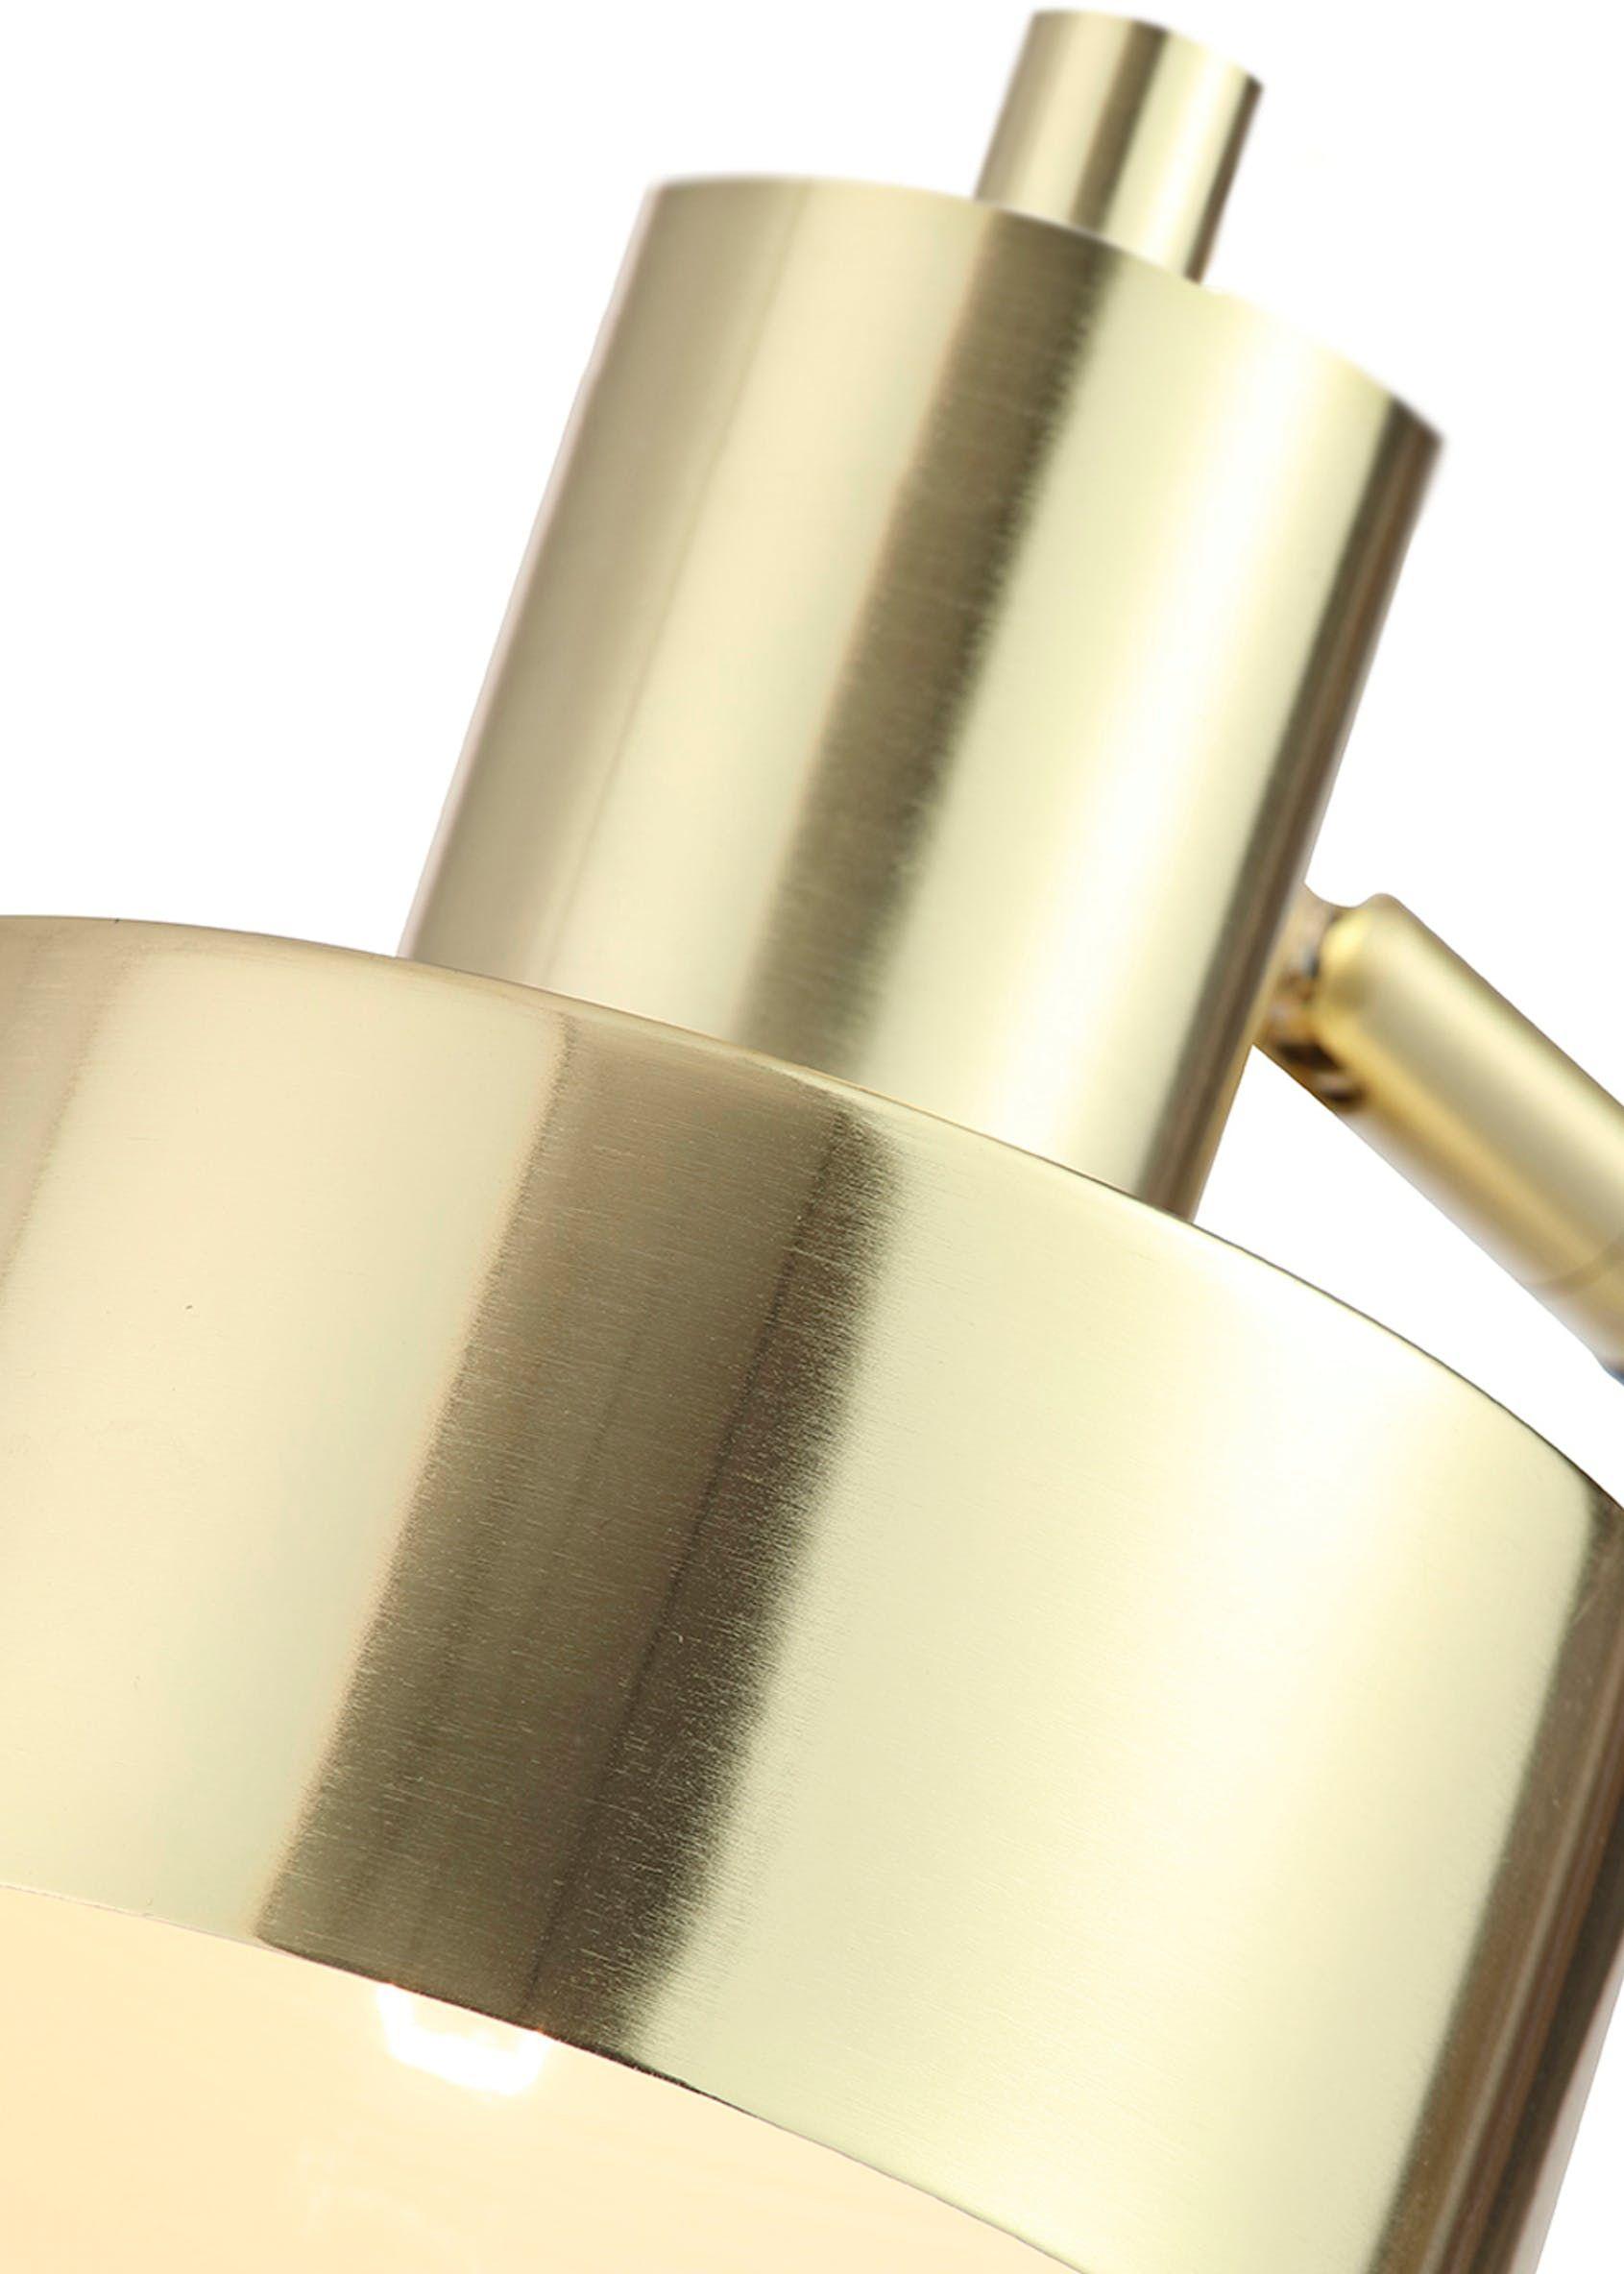 Cantilever Floor Lamp (H121.5cm x W84cm) Gold in 2020